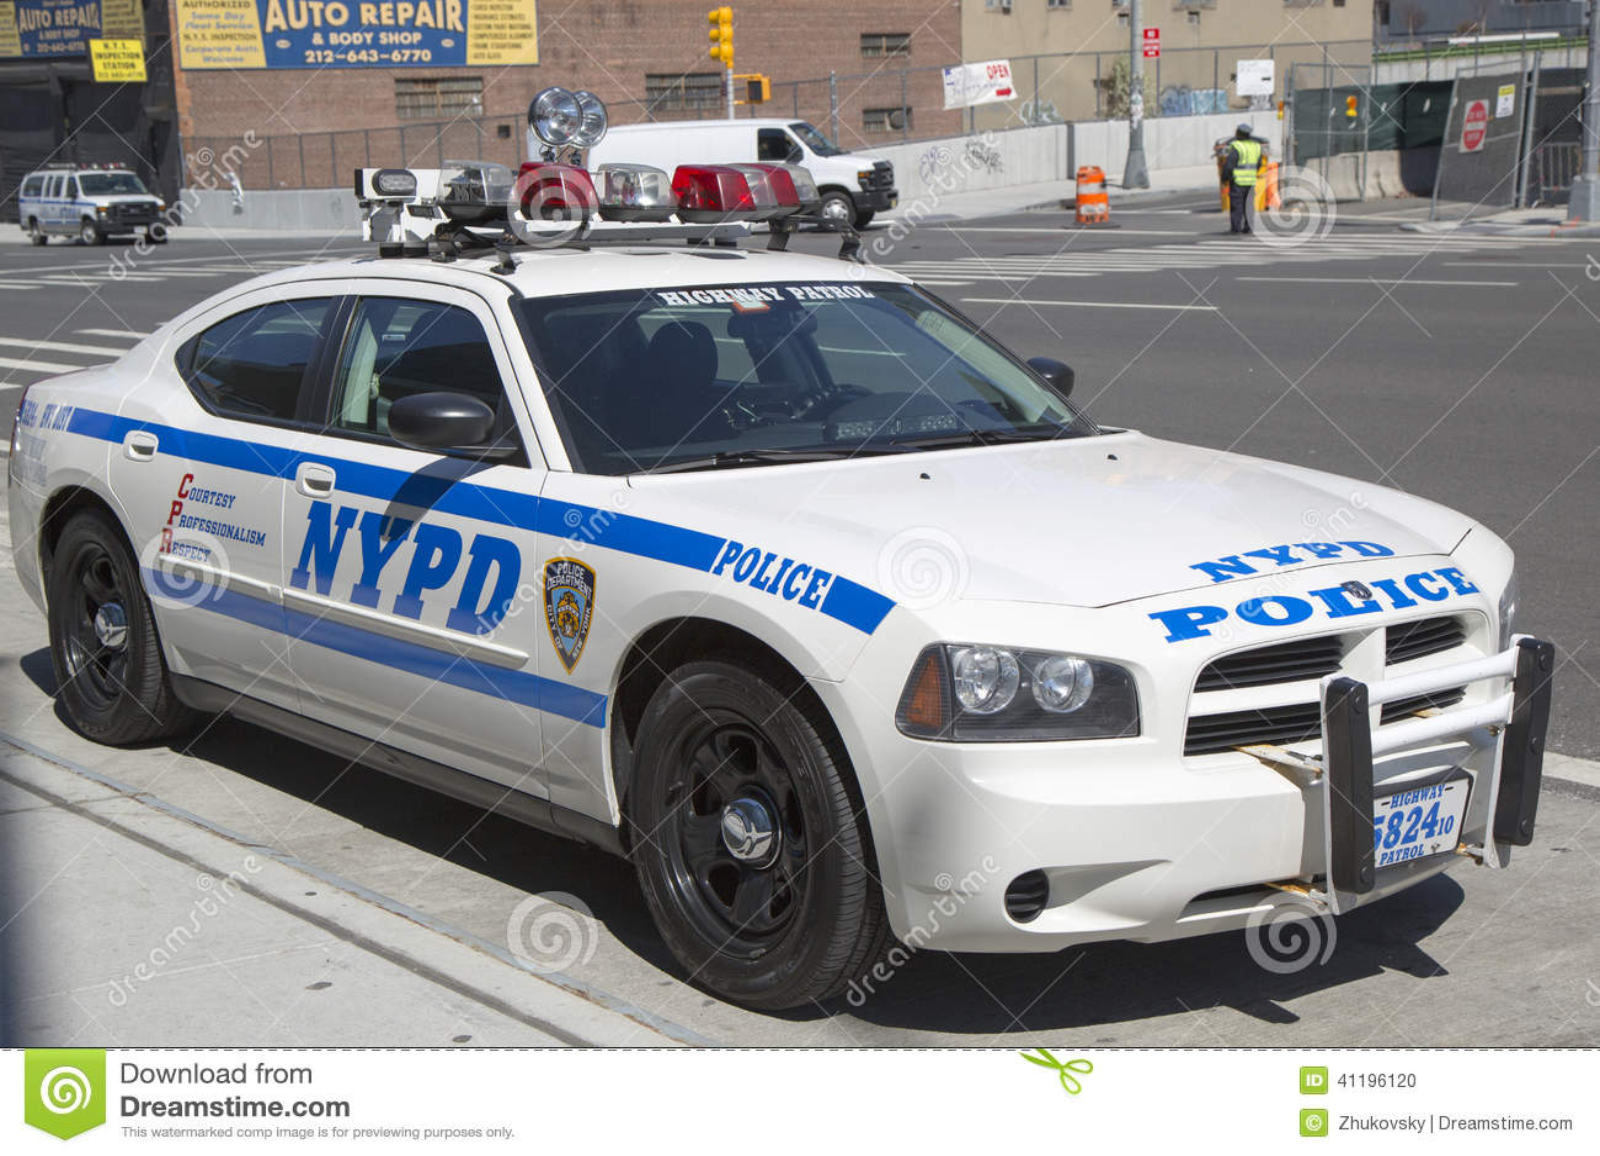 Nypd Highway Patrol Car In Manhattan Editorial Image